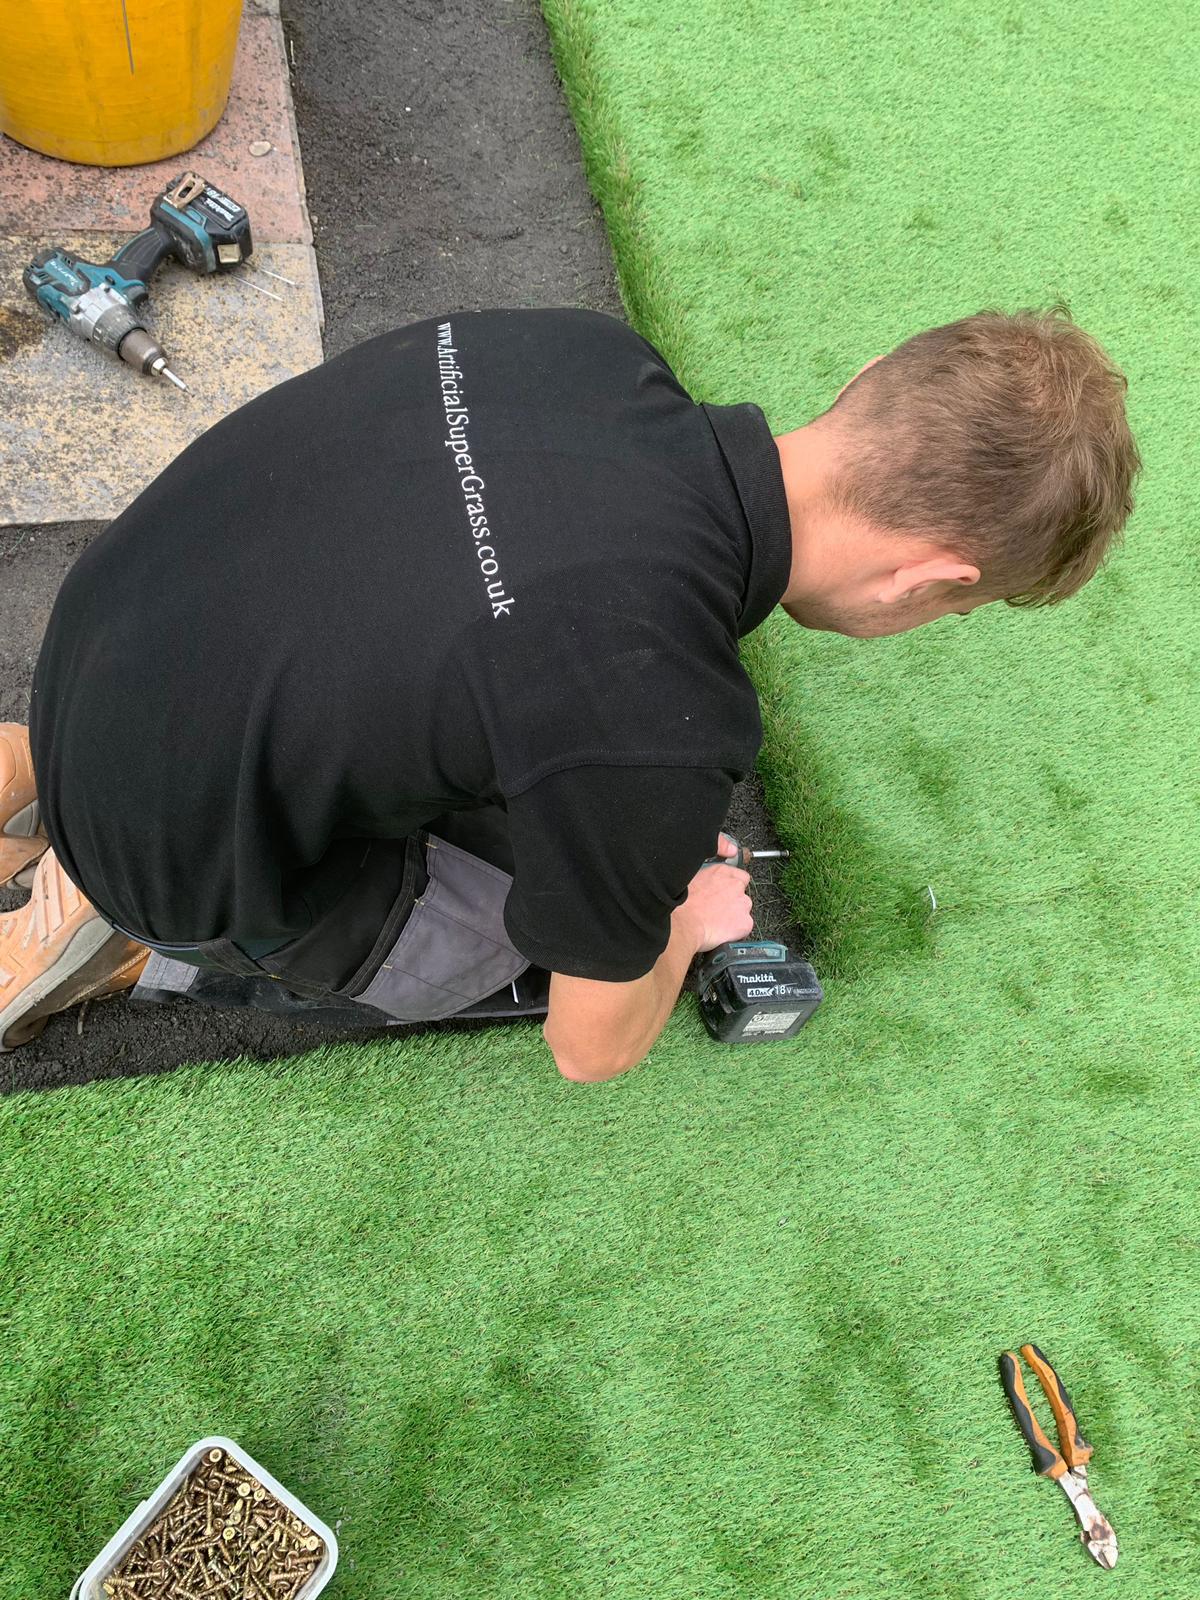 Artificial Grass For Dogs Malton Artificial Super Grass